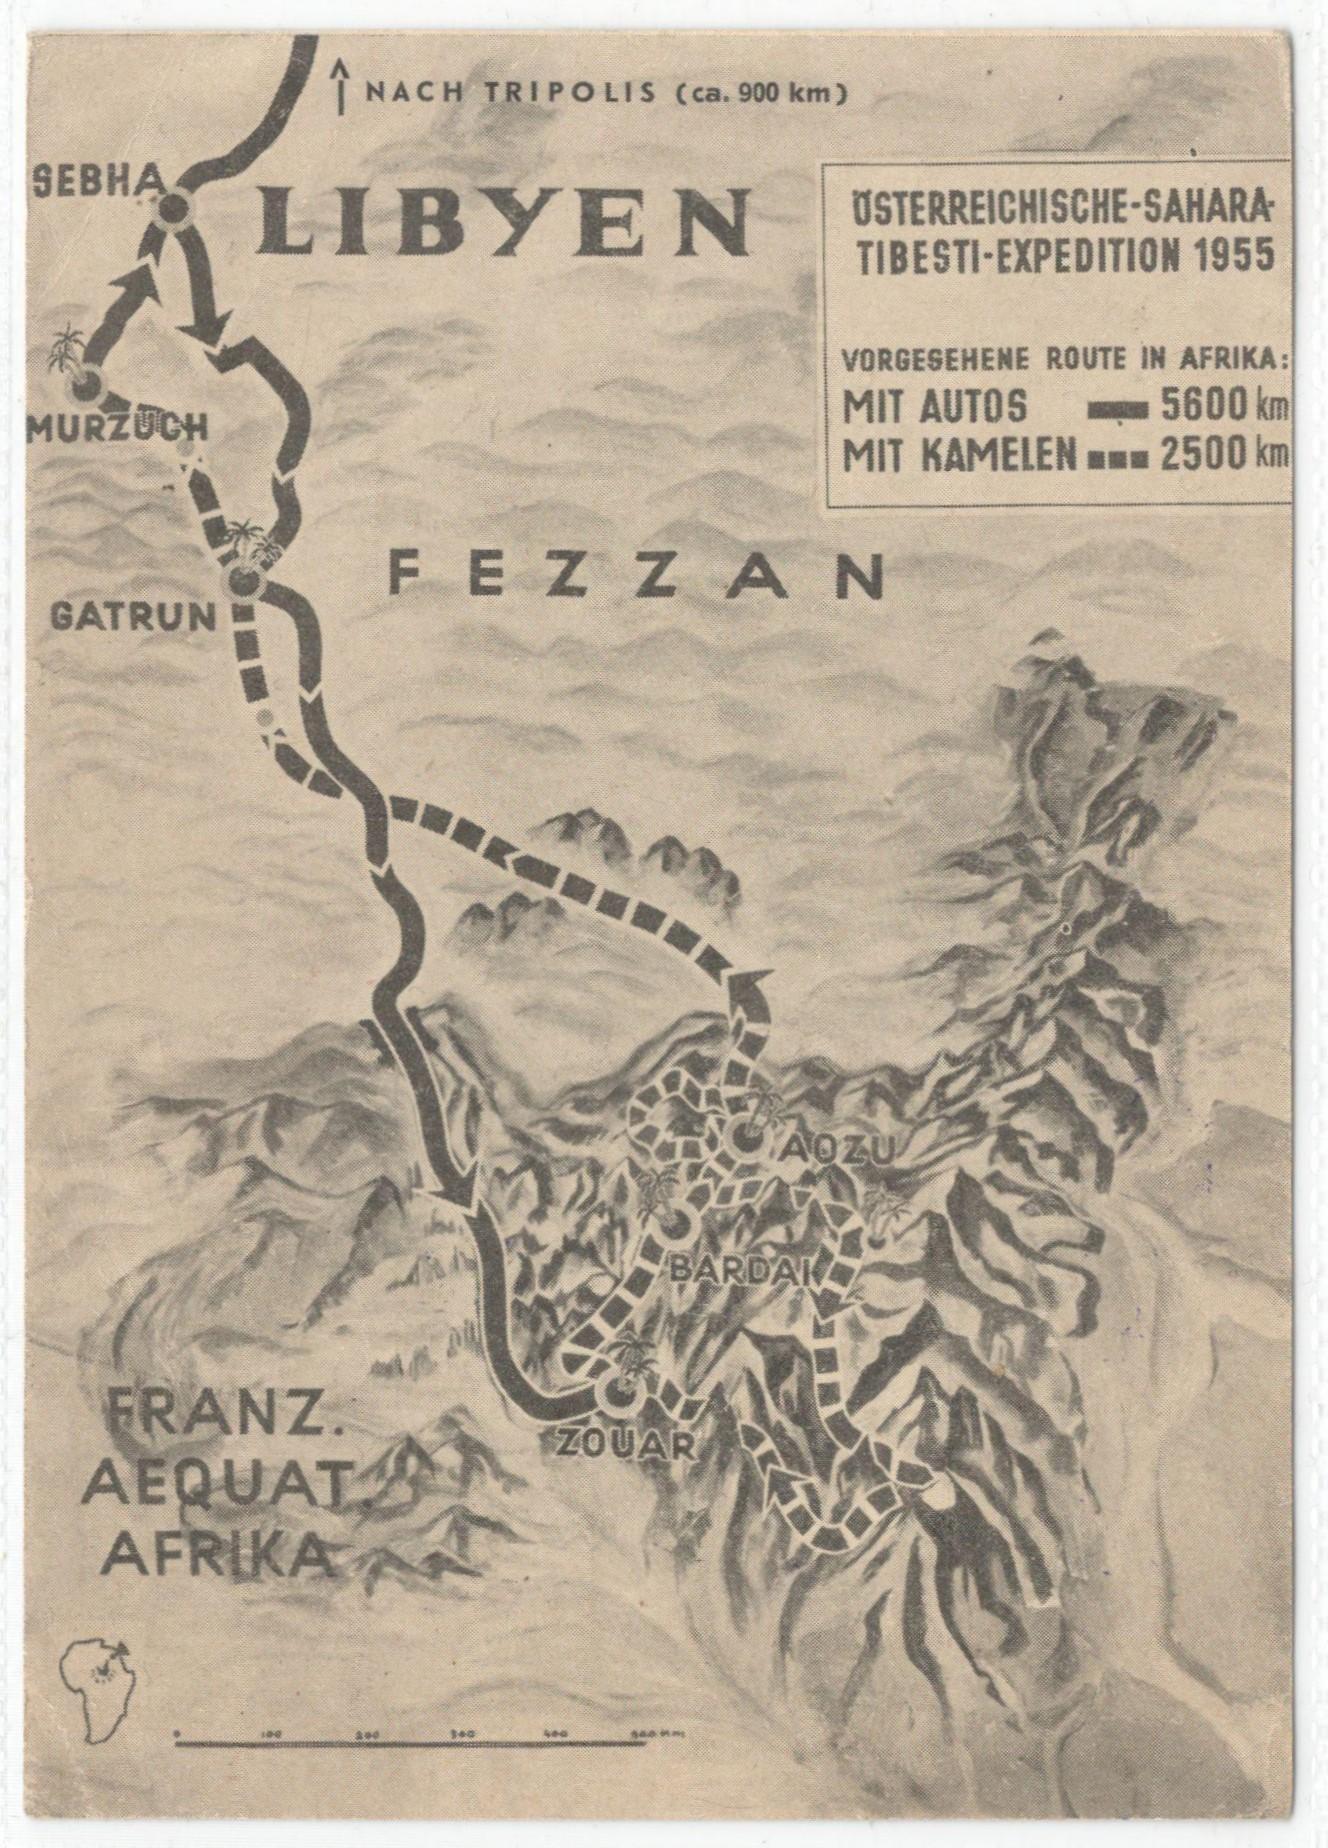 THE AUSTRIAN SAHARA TIBESTI EXPEDITION 1955 POSTCARD